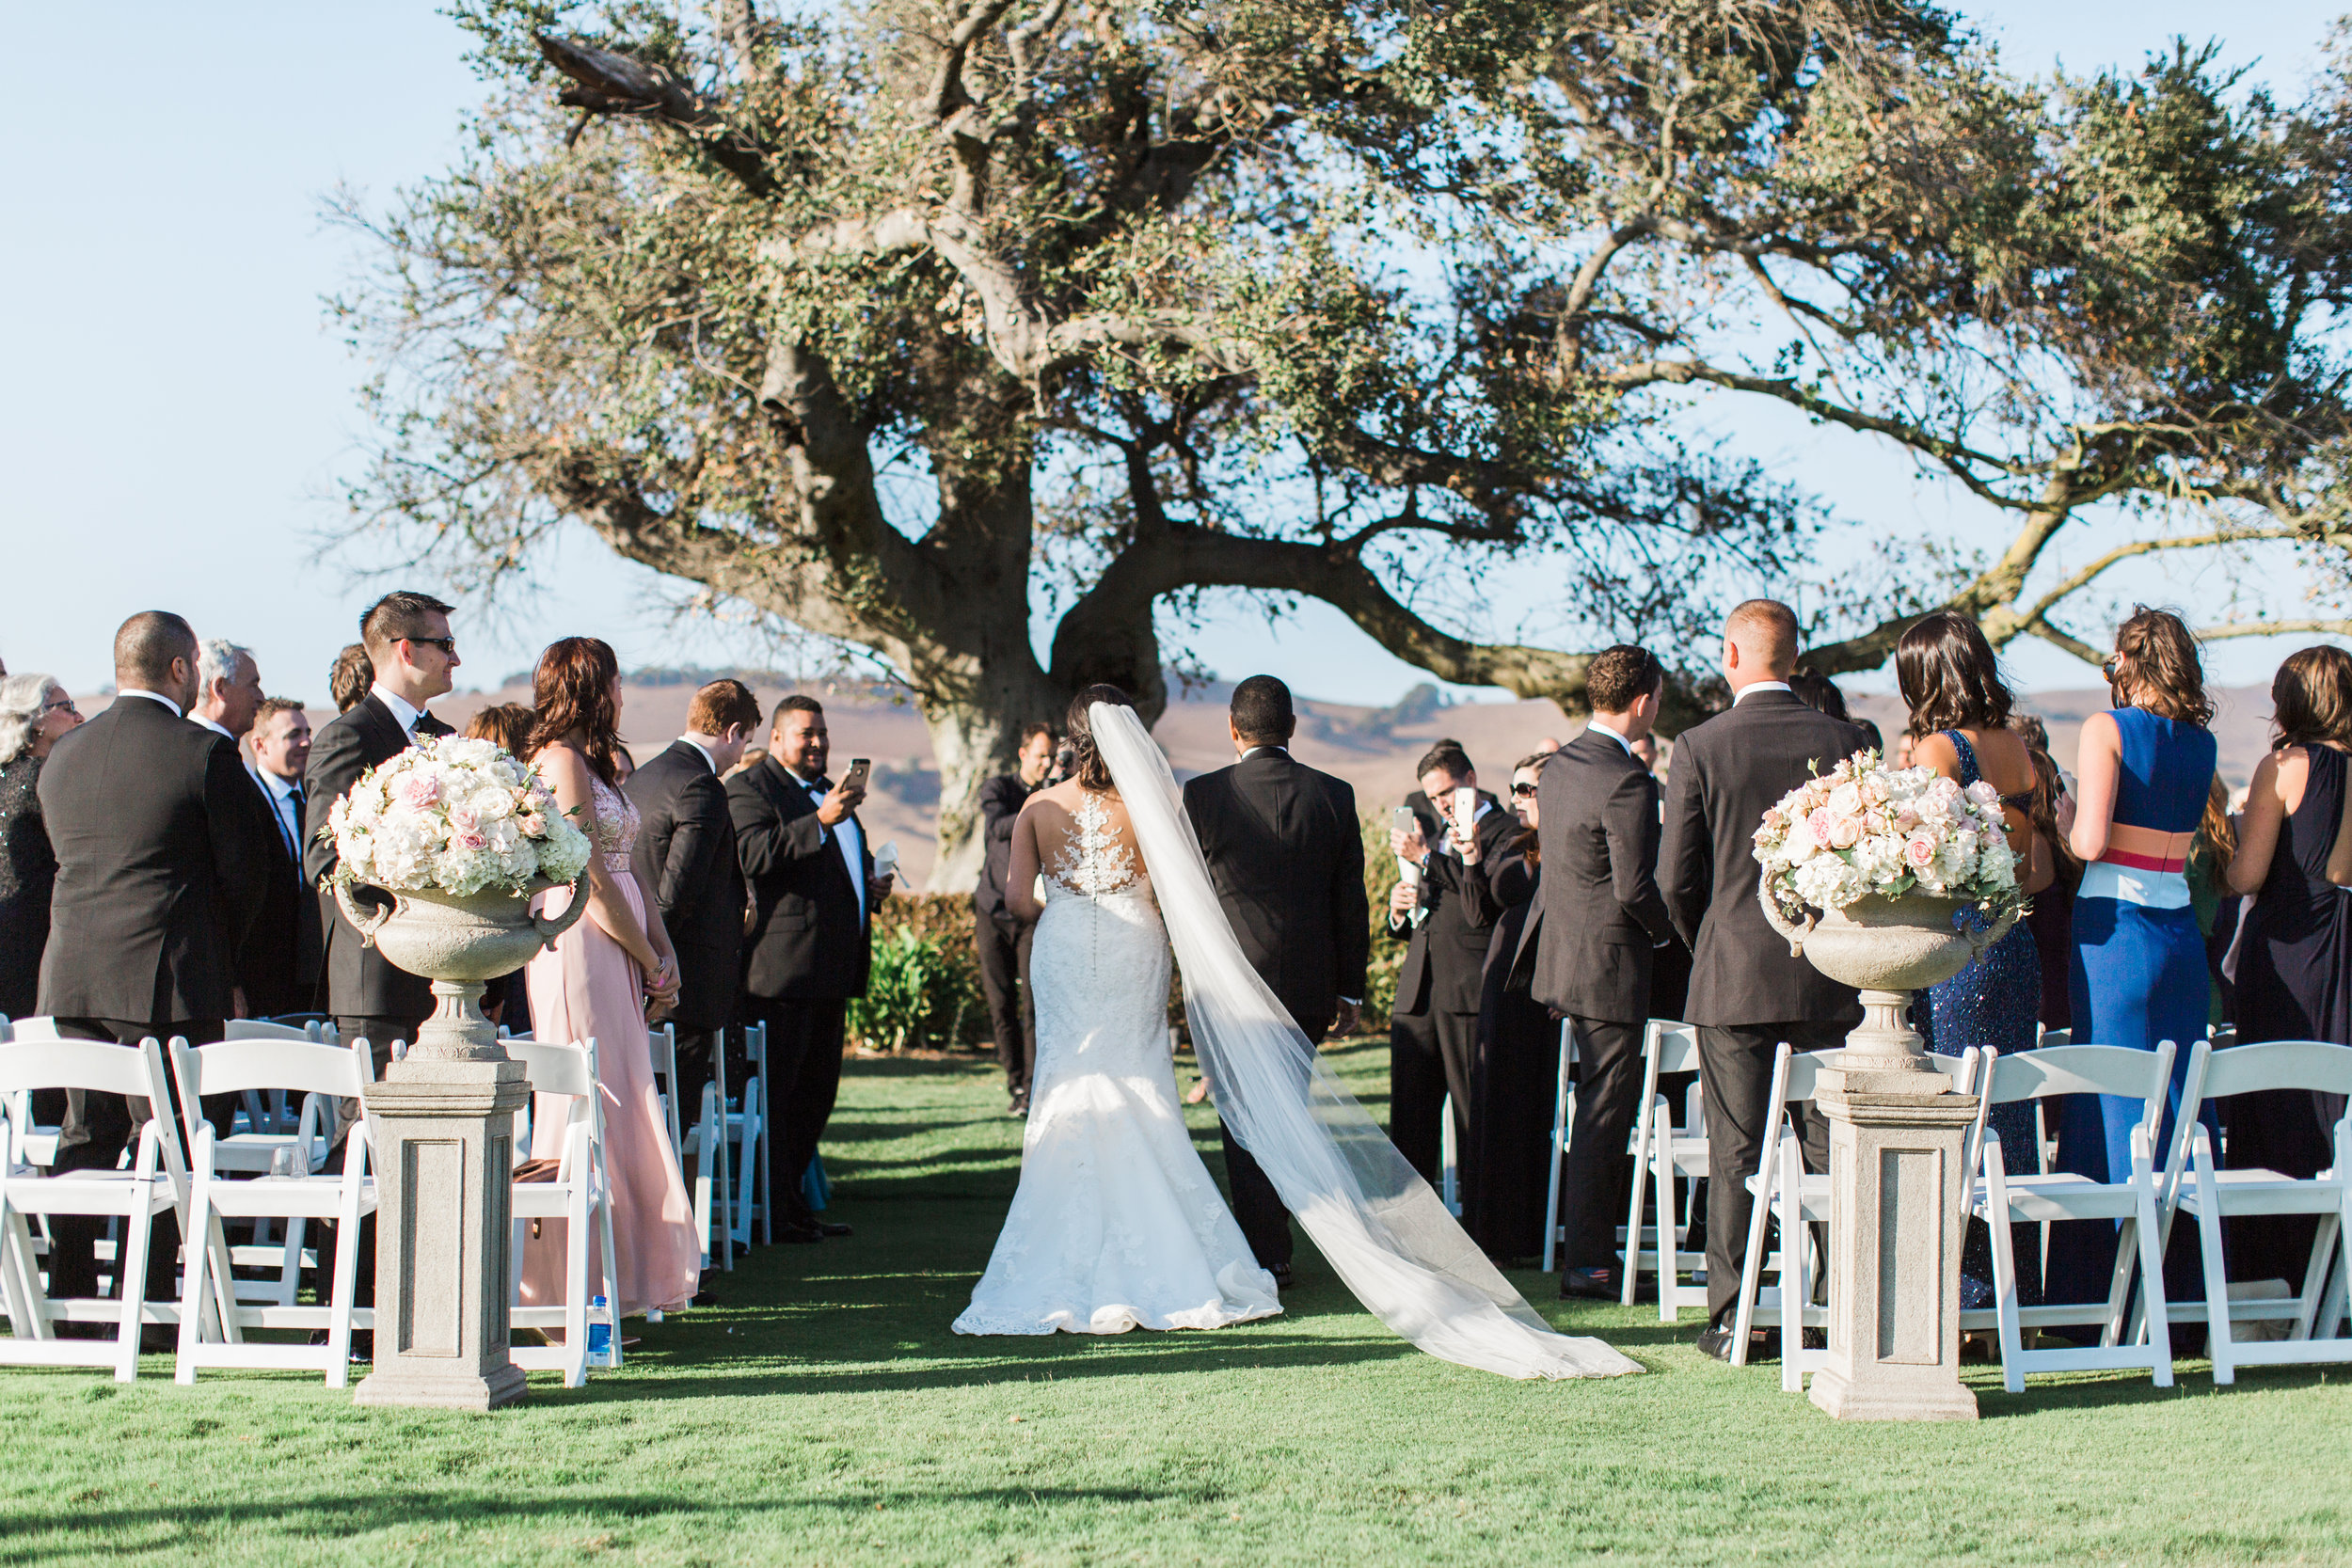 jenny-and-george-wedding-roque-events-meyerott-photography 759.jpg